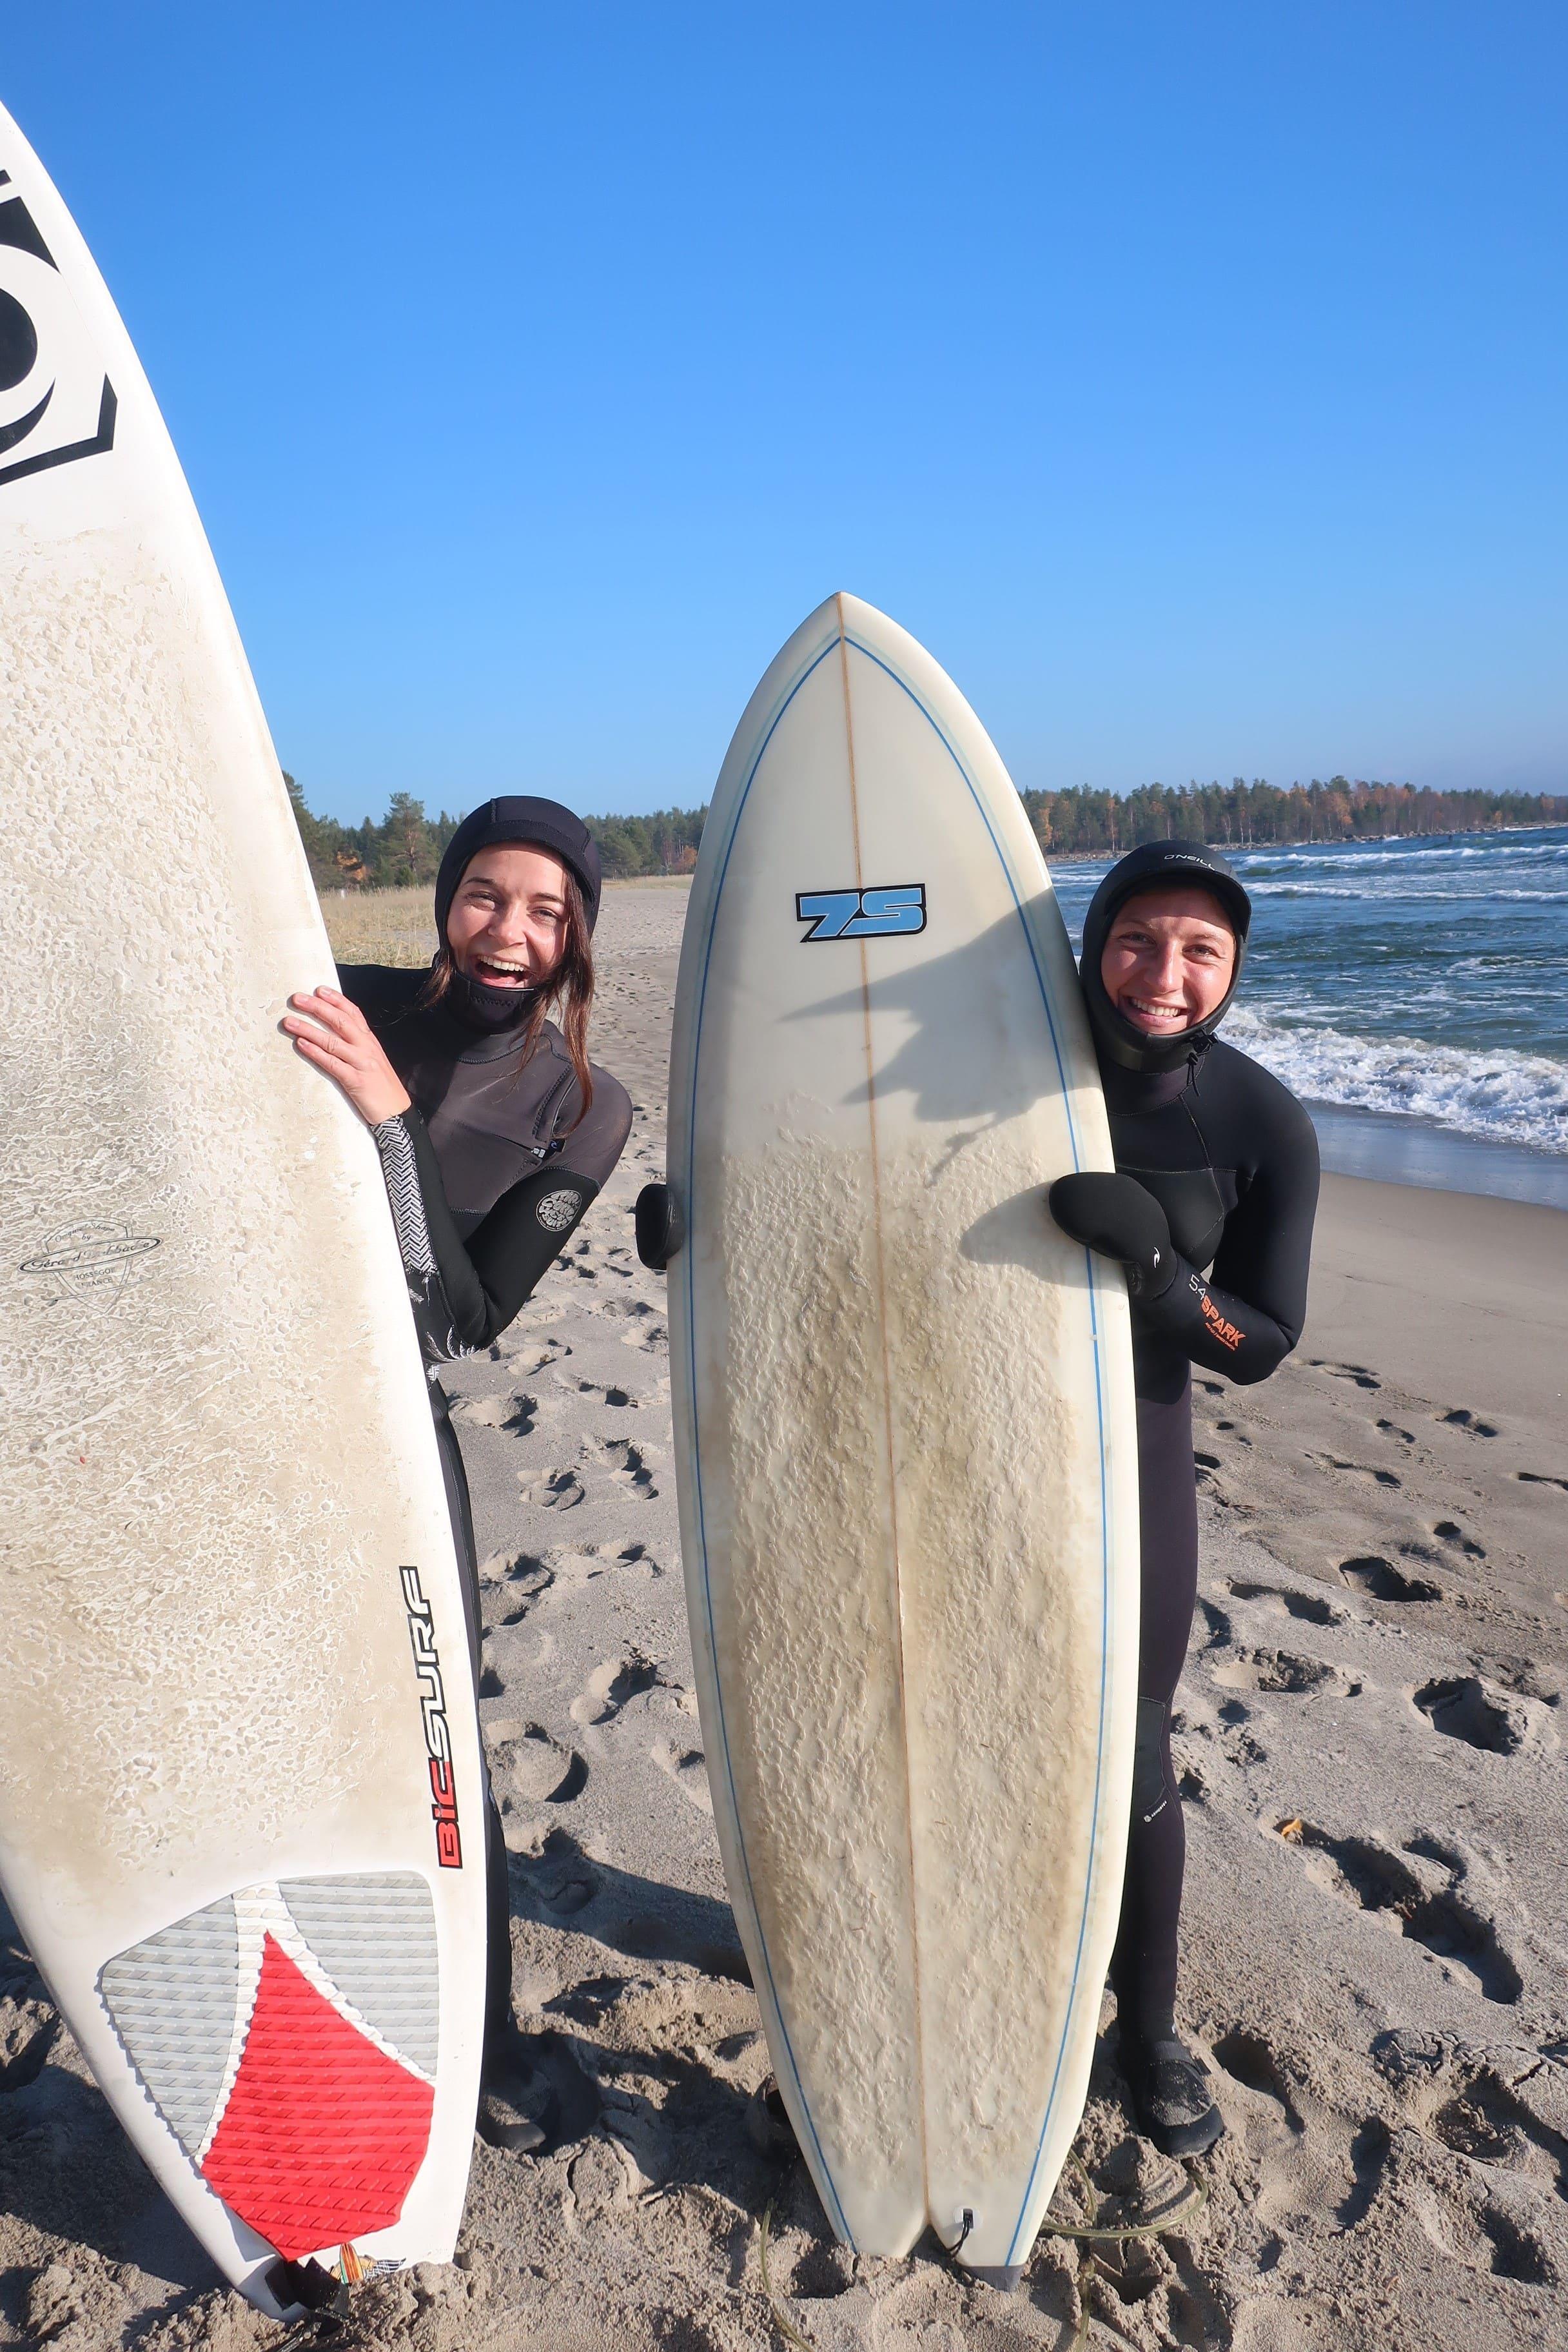 On Edge surfing